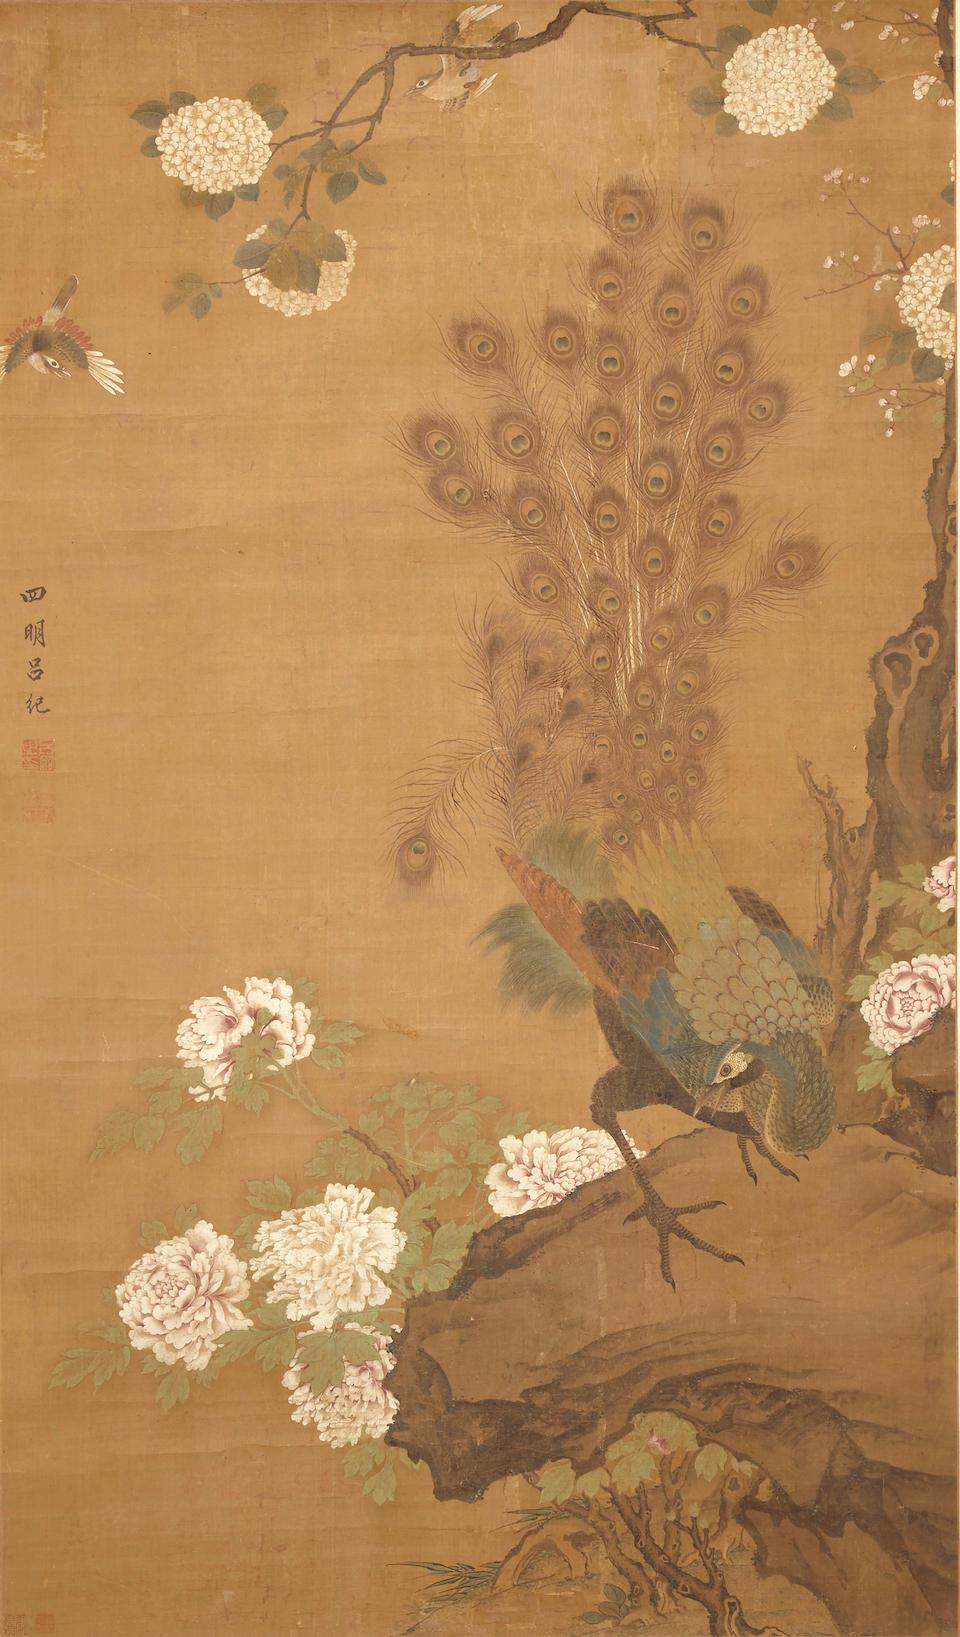 After Lü Ji (19th century)  Peacock and Peony